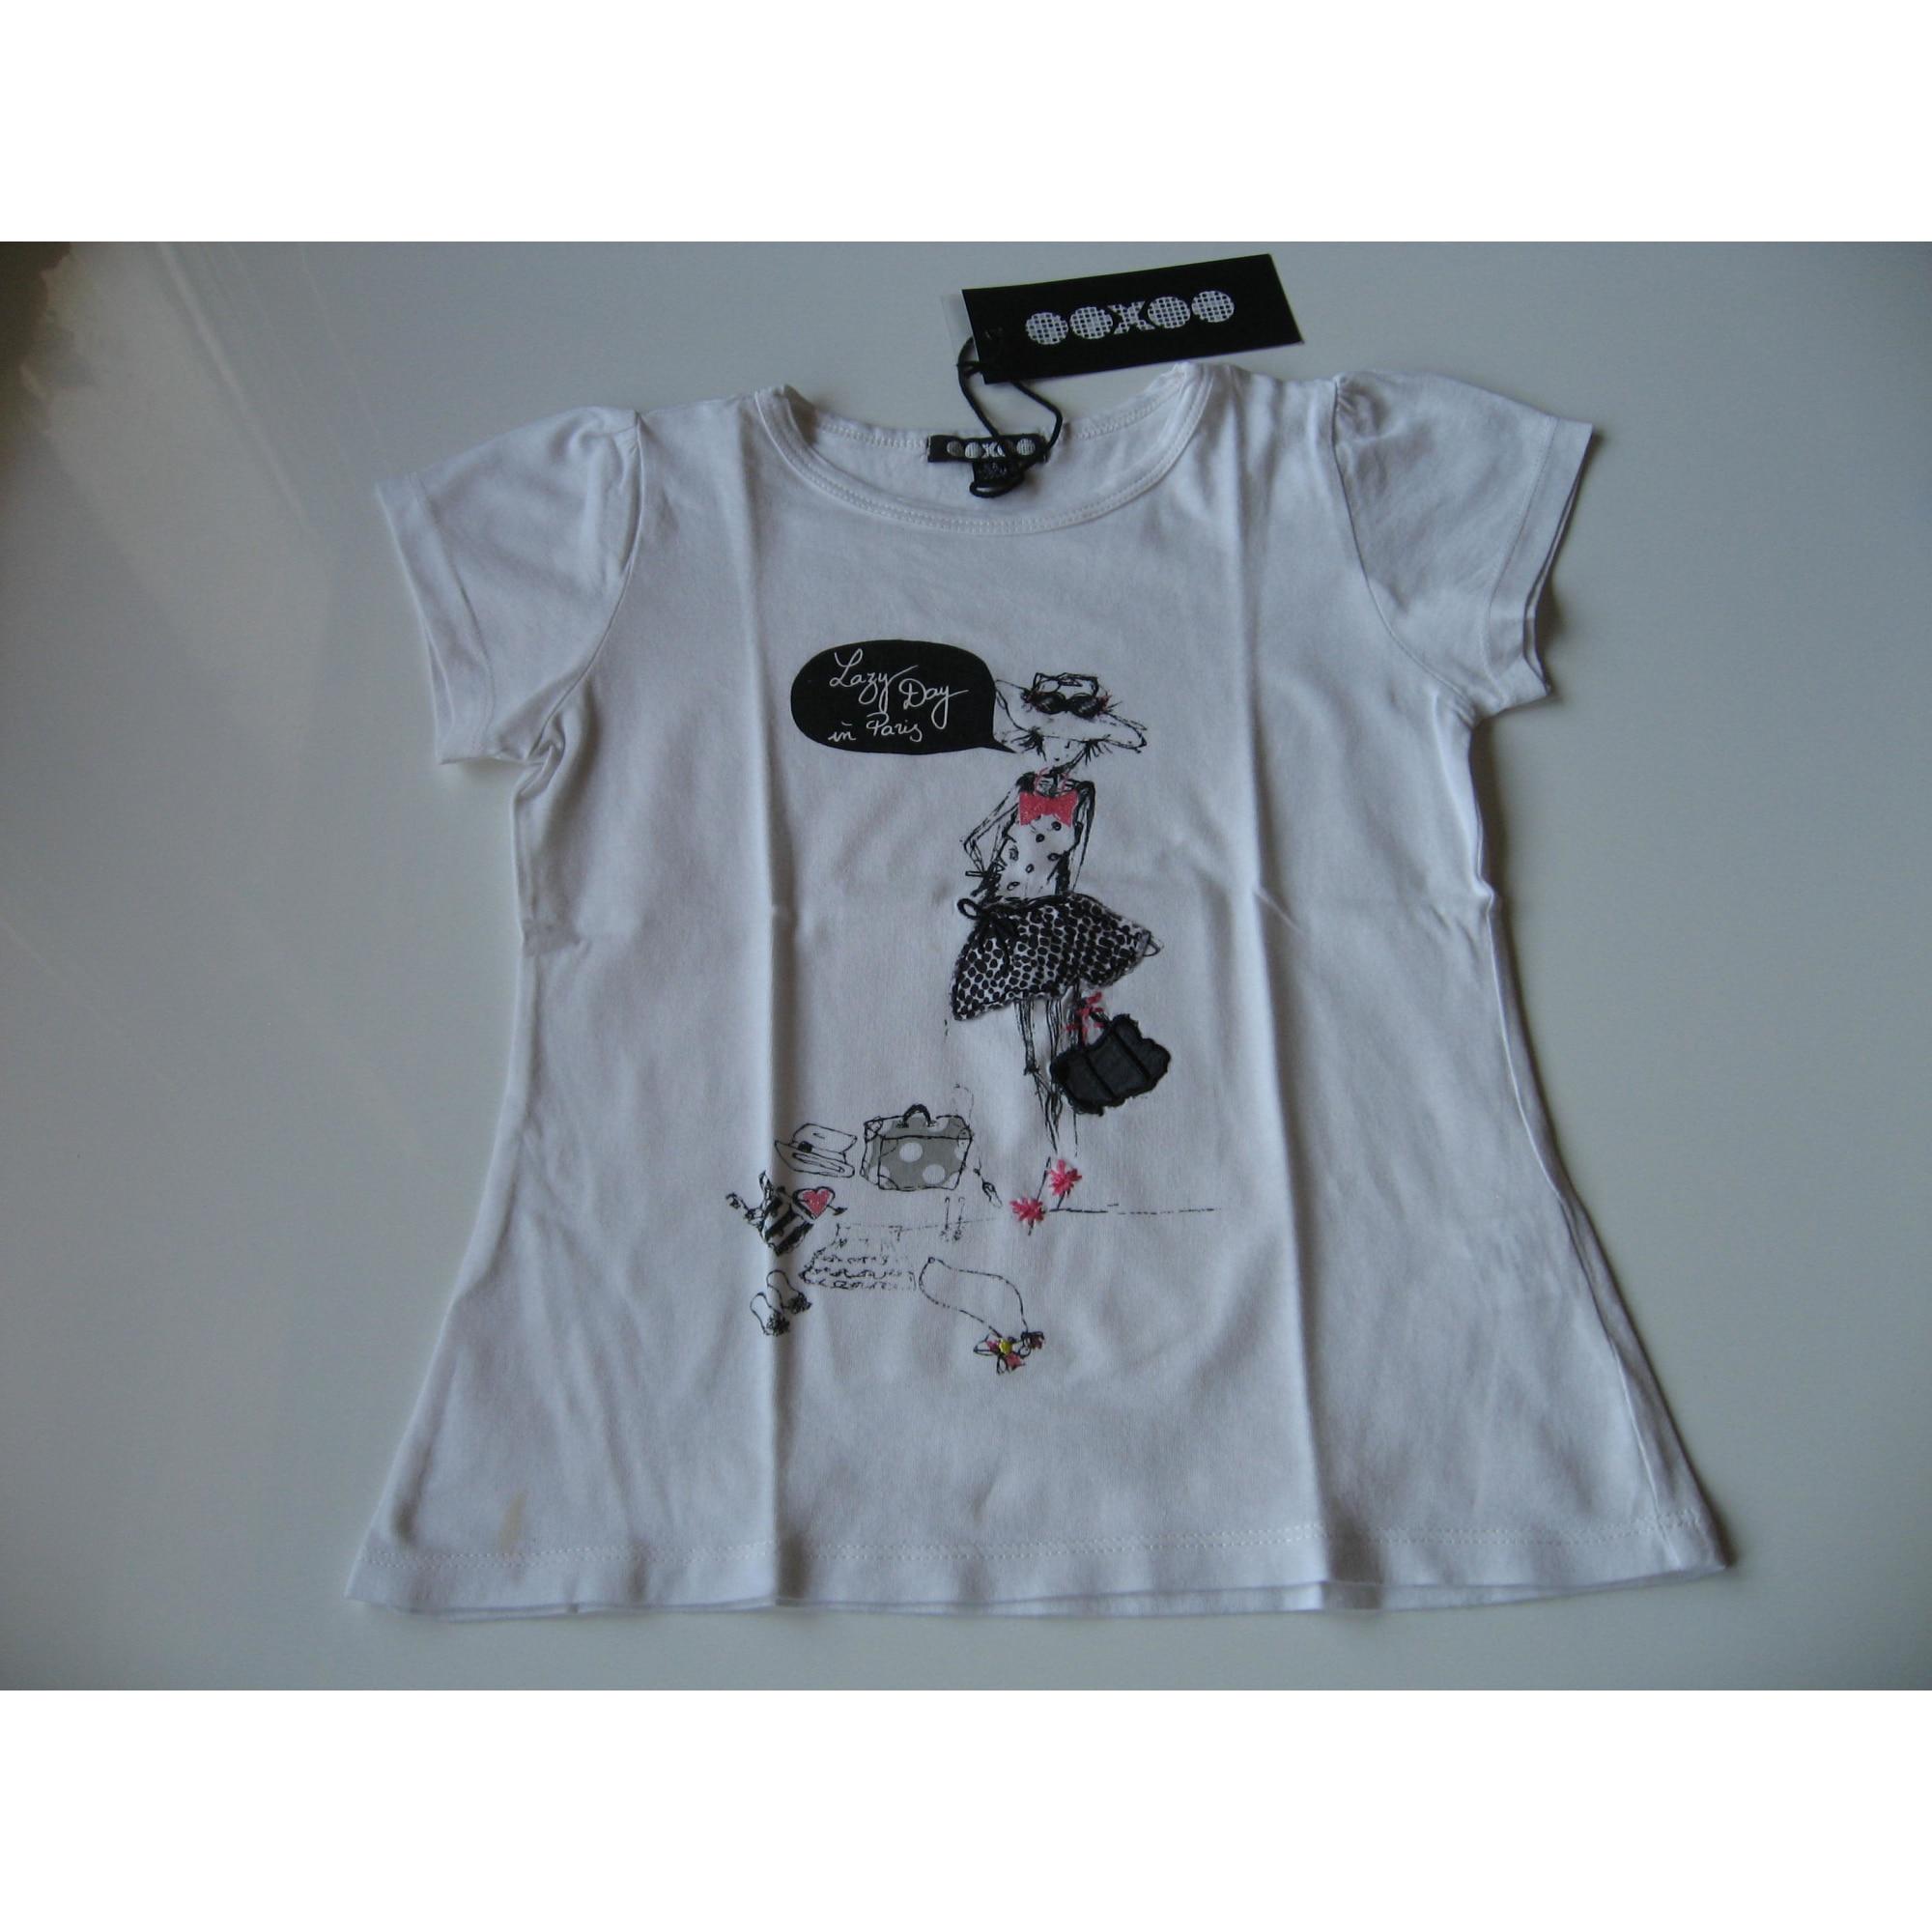 Top, Tee-shirt OOXOO Blanc, blanc cassé, écru